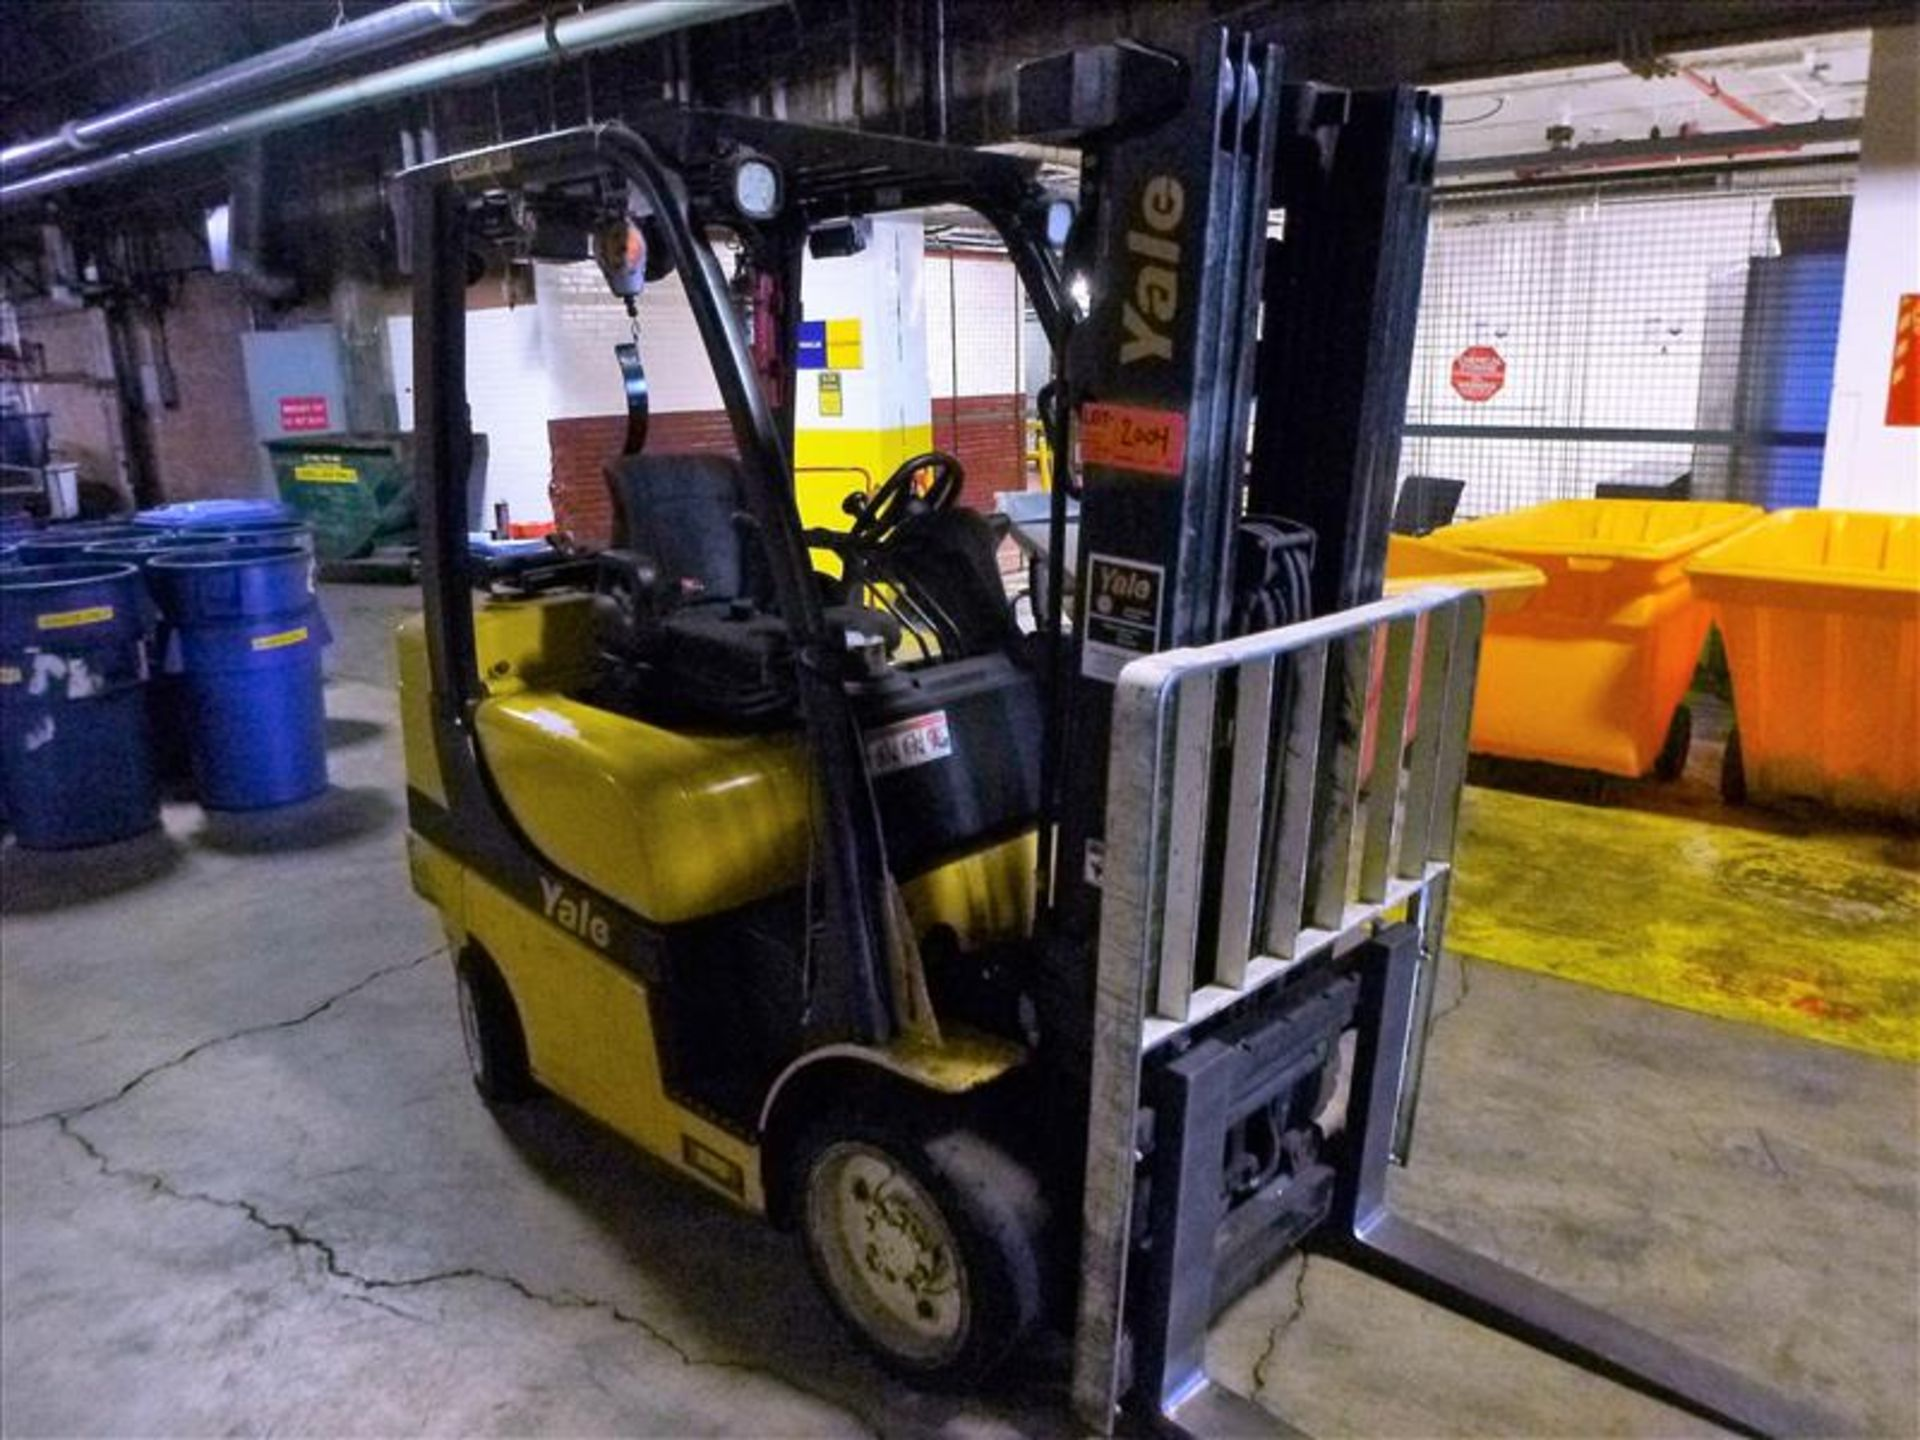 Yale fork lift truck, mod. GLC060VXNDAE085, ser. no. C910V01994N, LPG, 5500 lbs cap., 181 in. lift